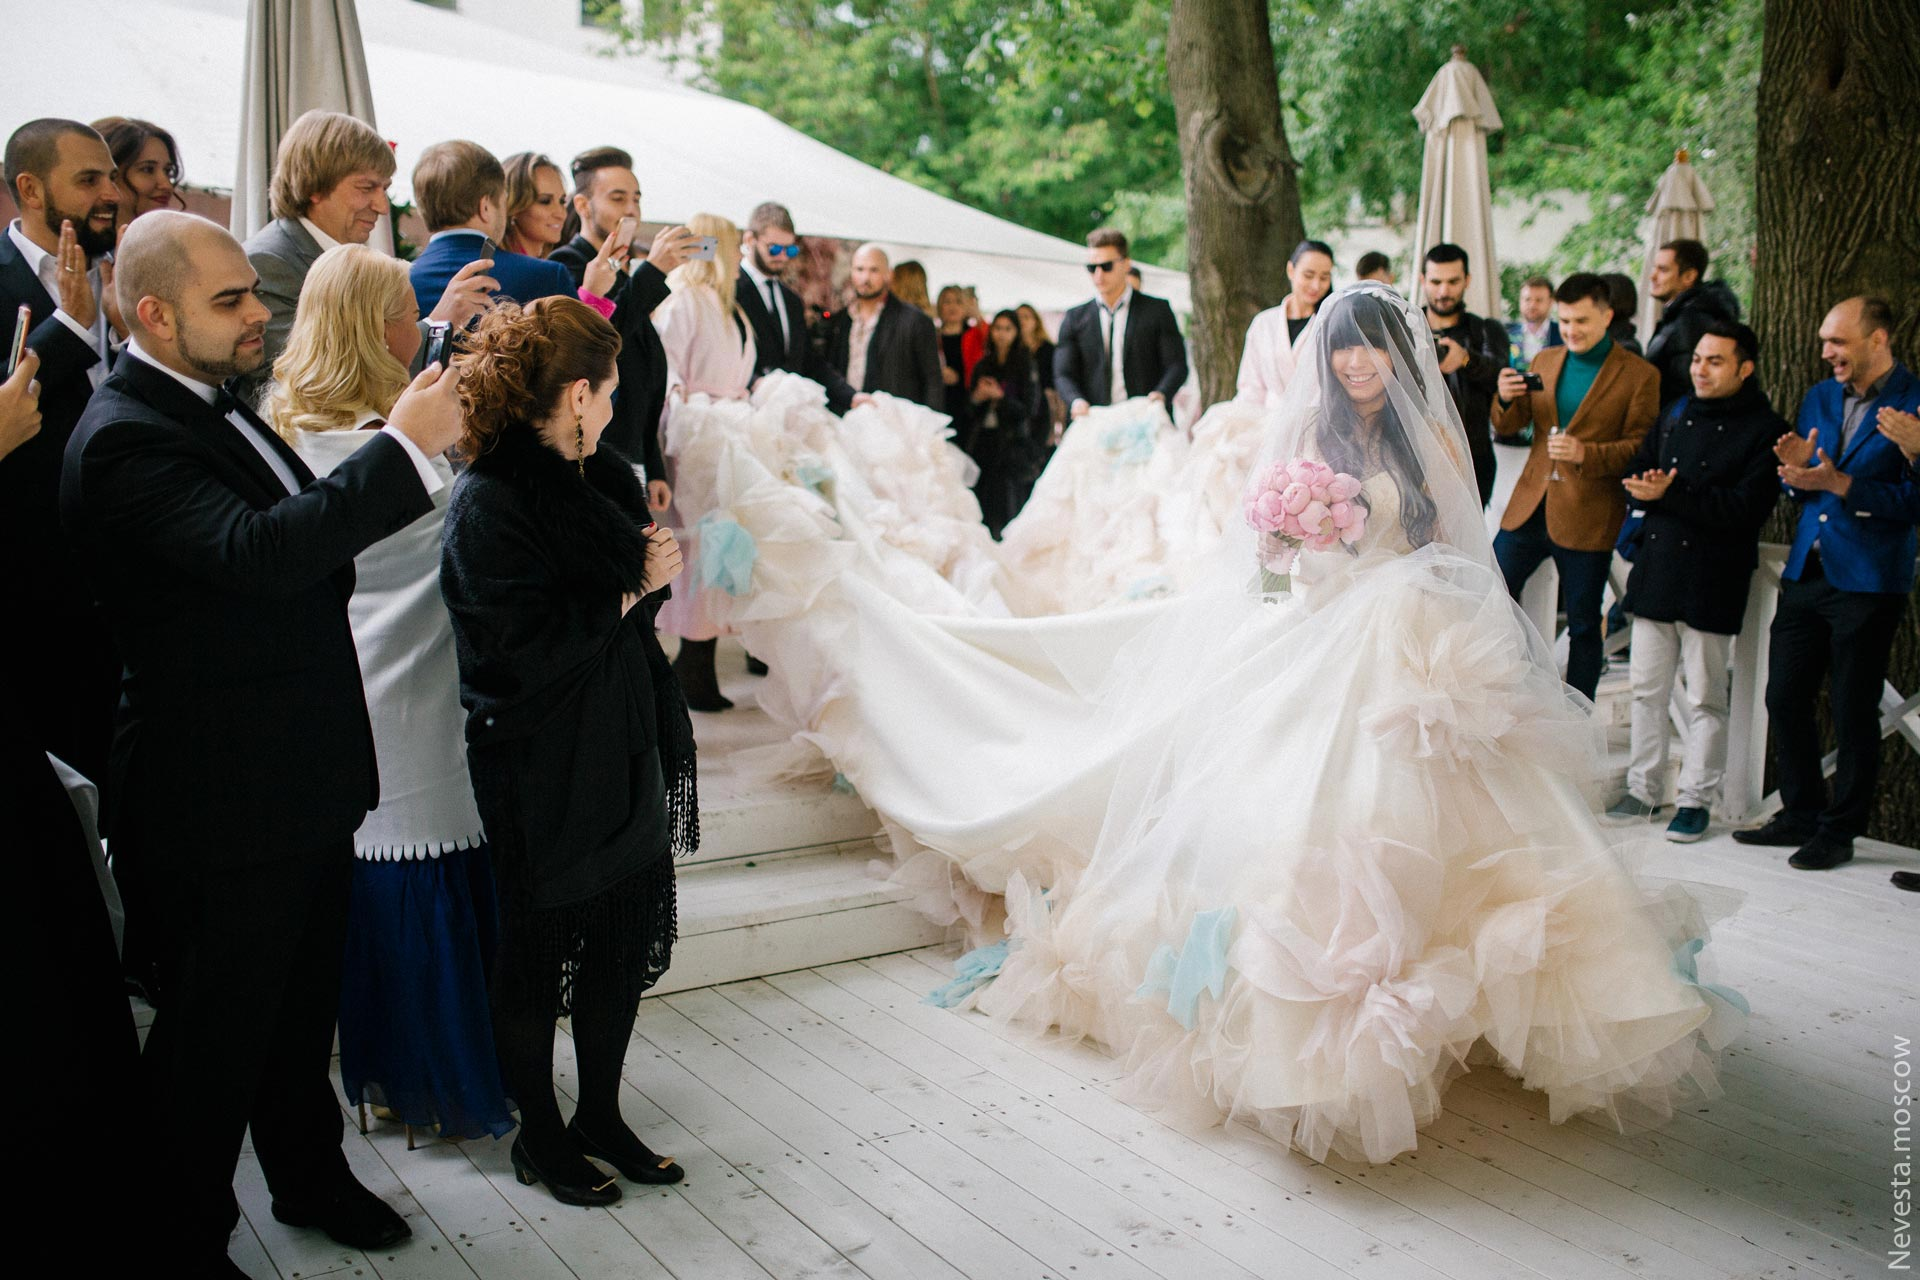 Свадьба Нелли Ермолаевой и Кирилла Андреева фото 27